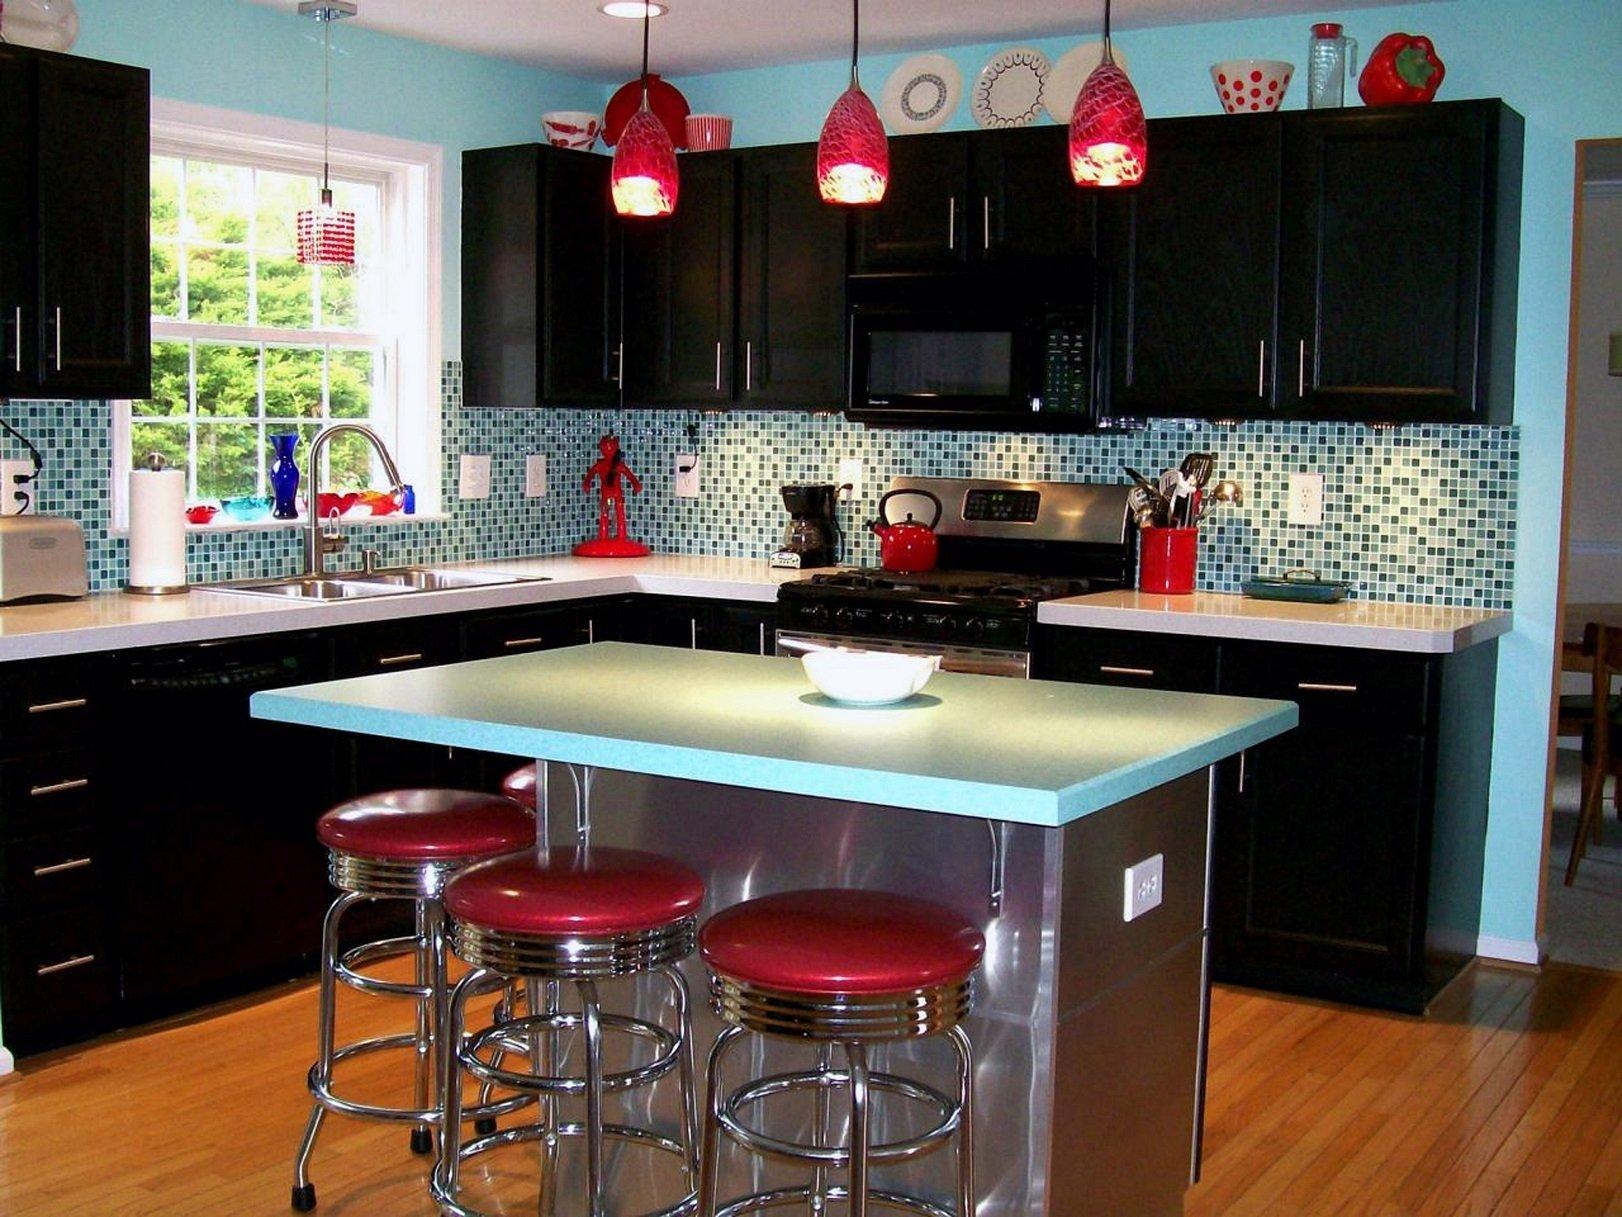 10 Pretty Kitchen Paint Ideas With Dark Cabinets kitchen paint colors with dark cabinets 2020